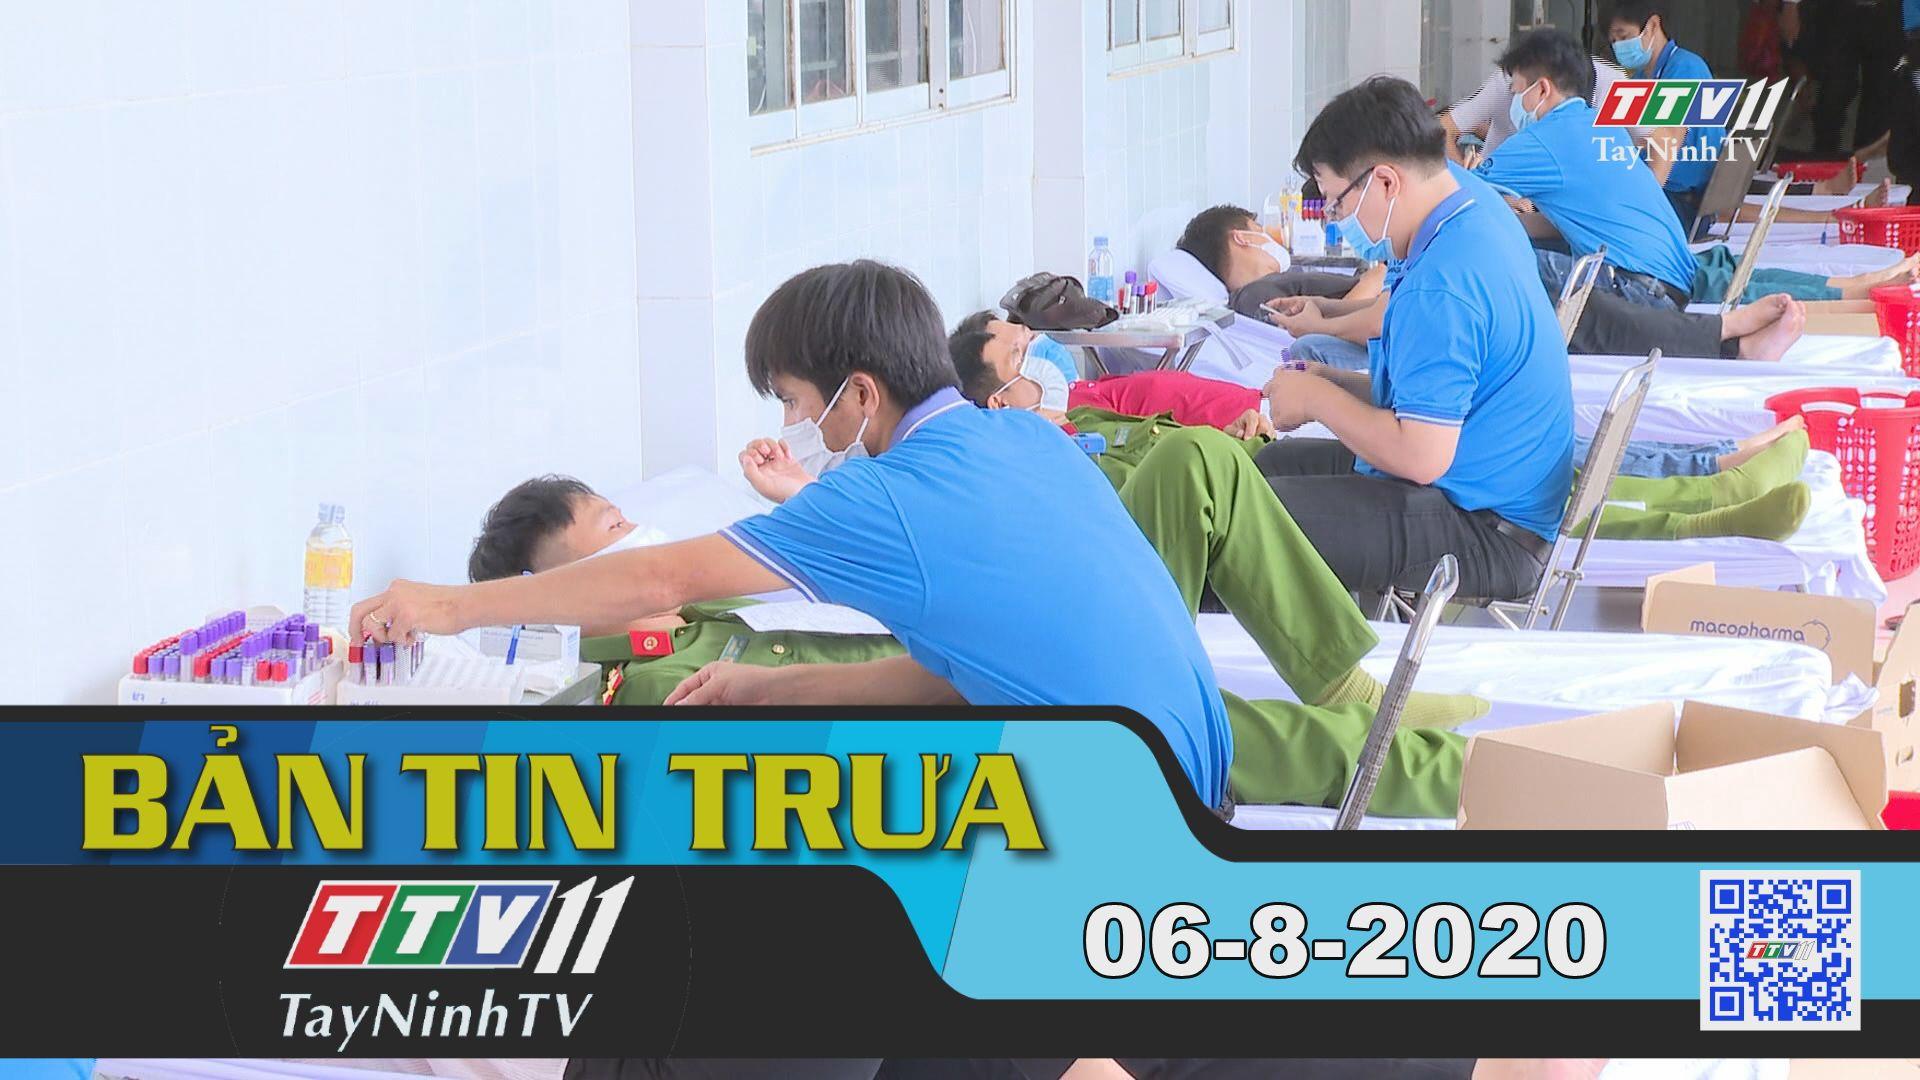 Bản tin trưa 06-8-2020 | Tin tức hôm nay | TayNinhTV